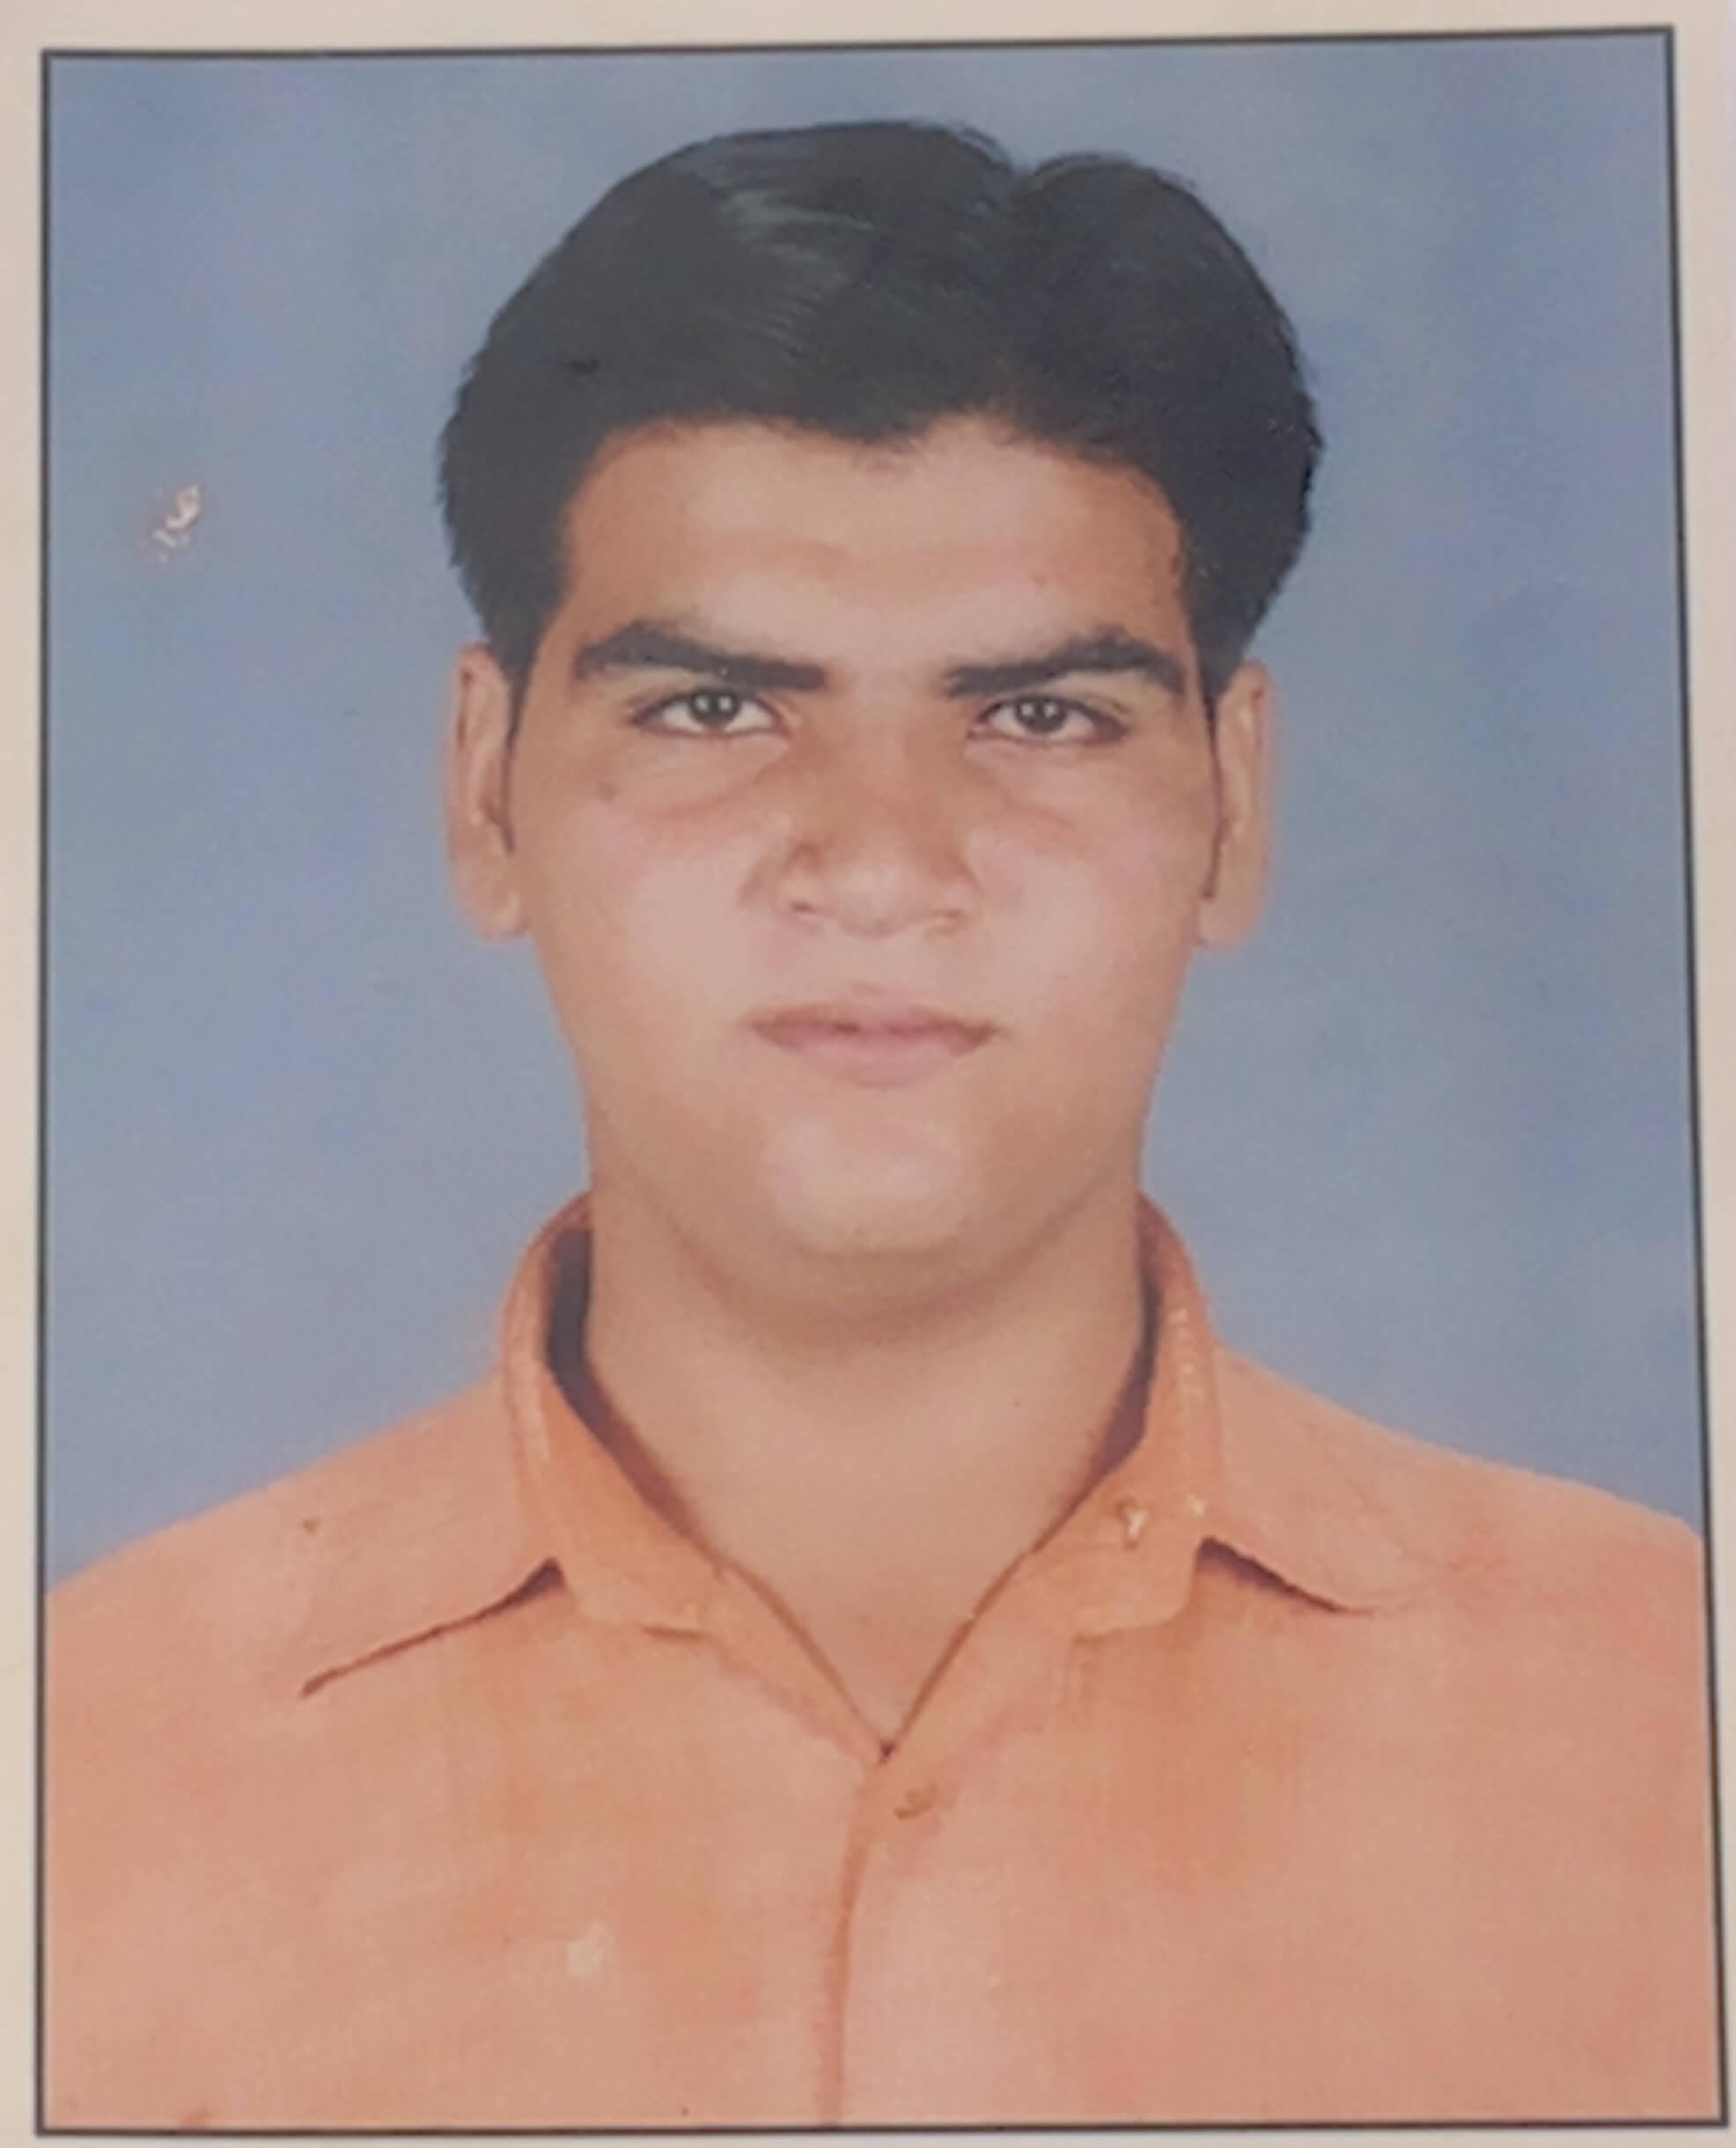 Harish Desai